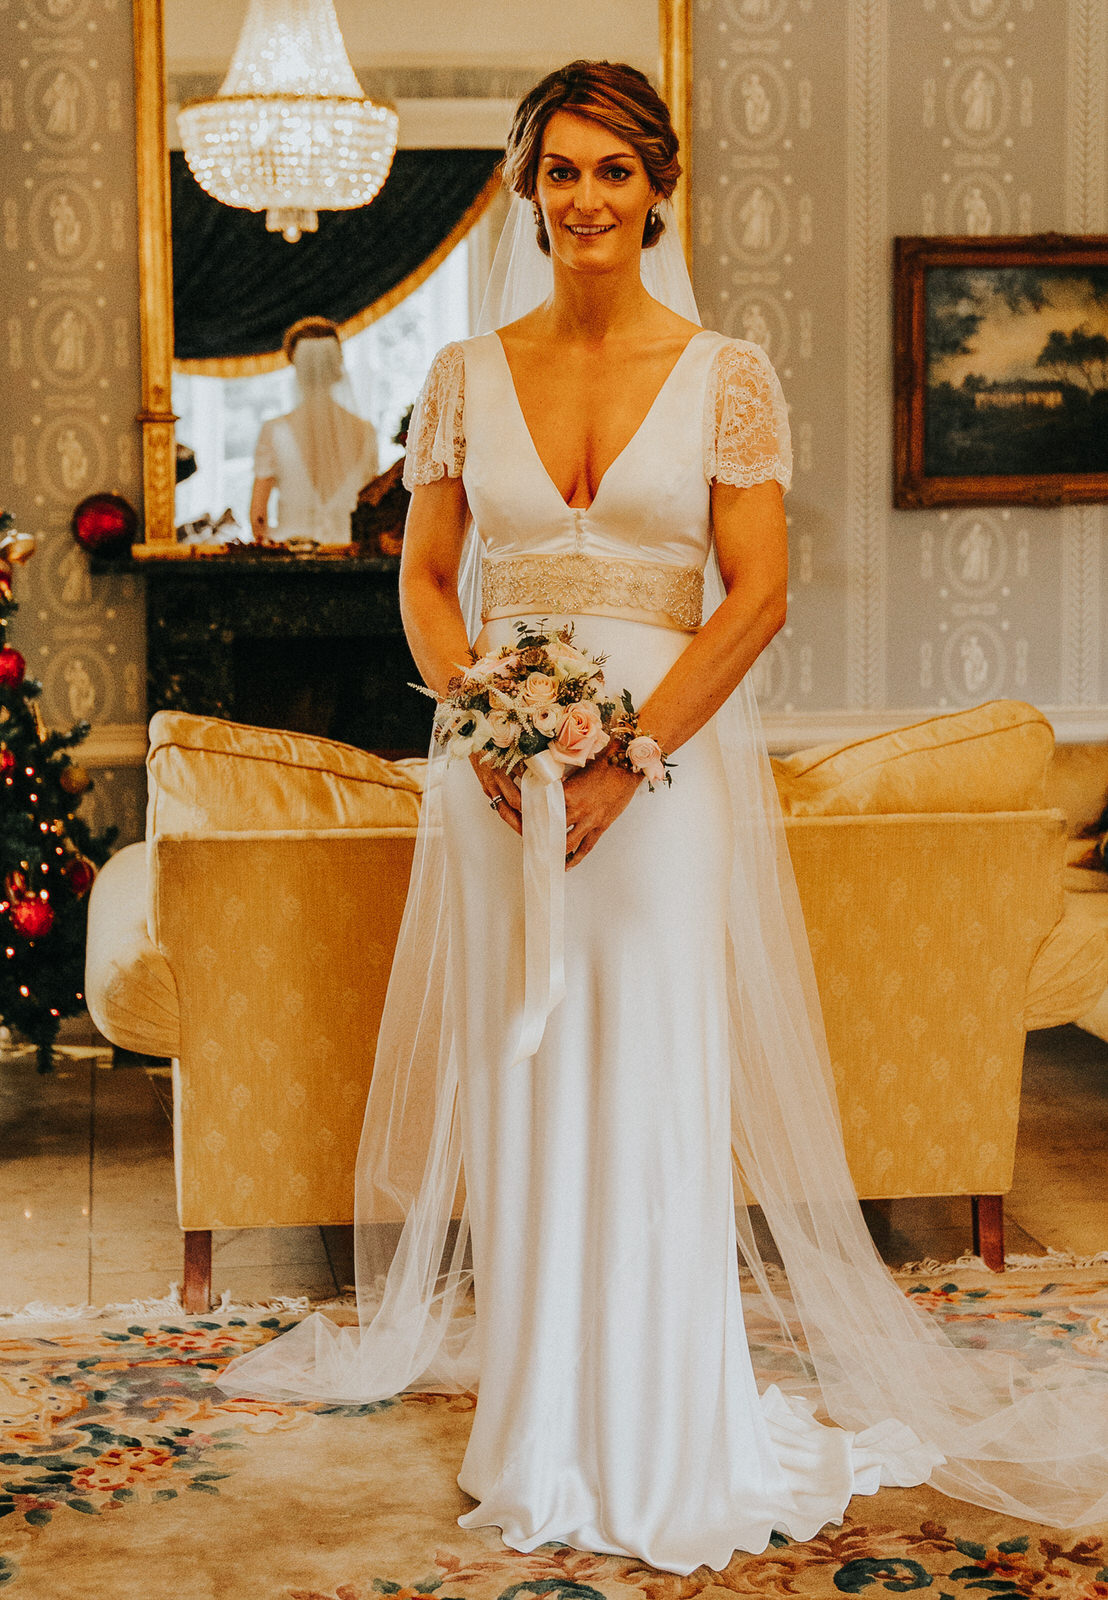 Dunbrody_House_Wedding_photographer_057.jpg